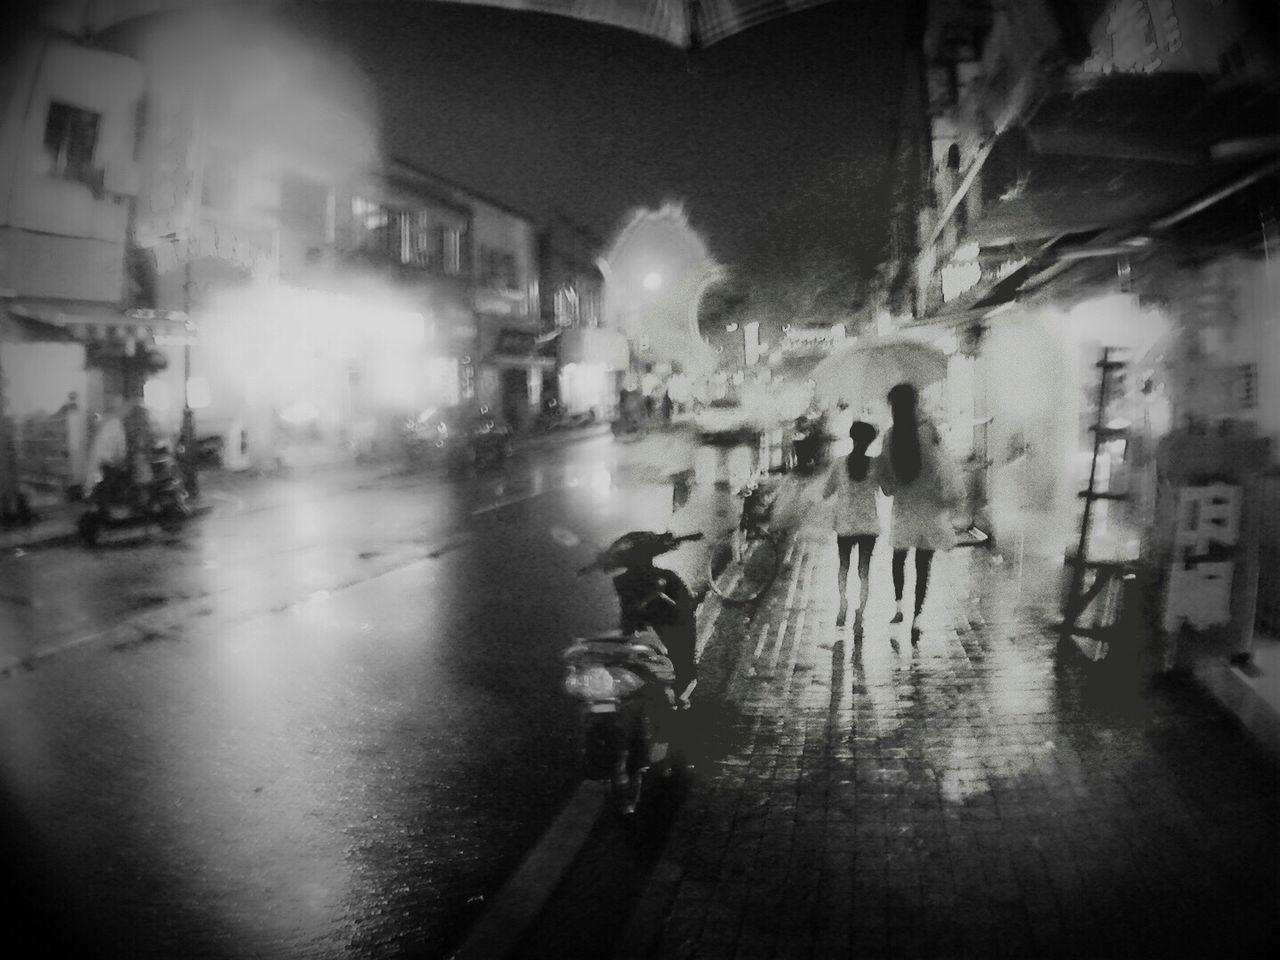 WET STREET IN RAINY SEASON